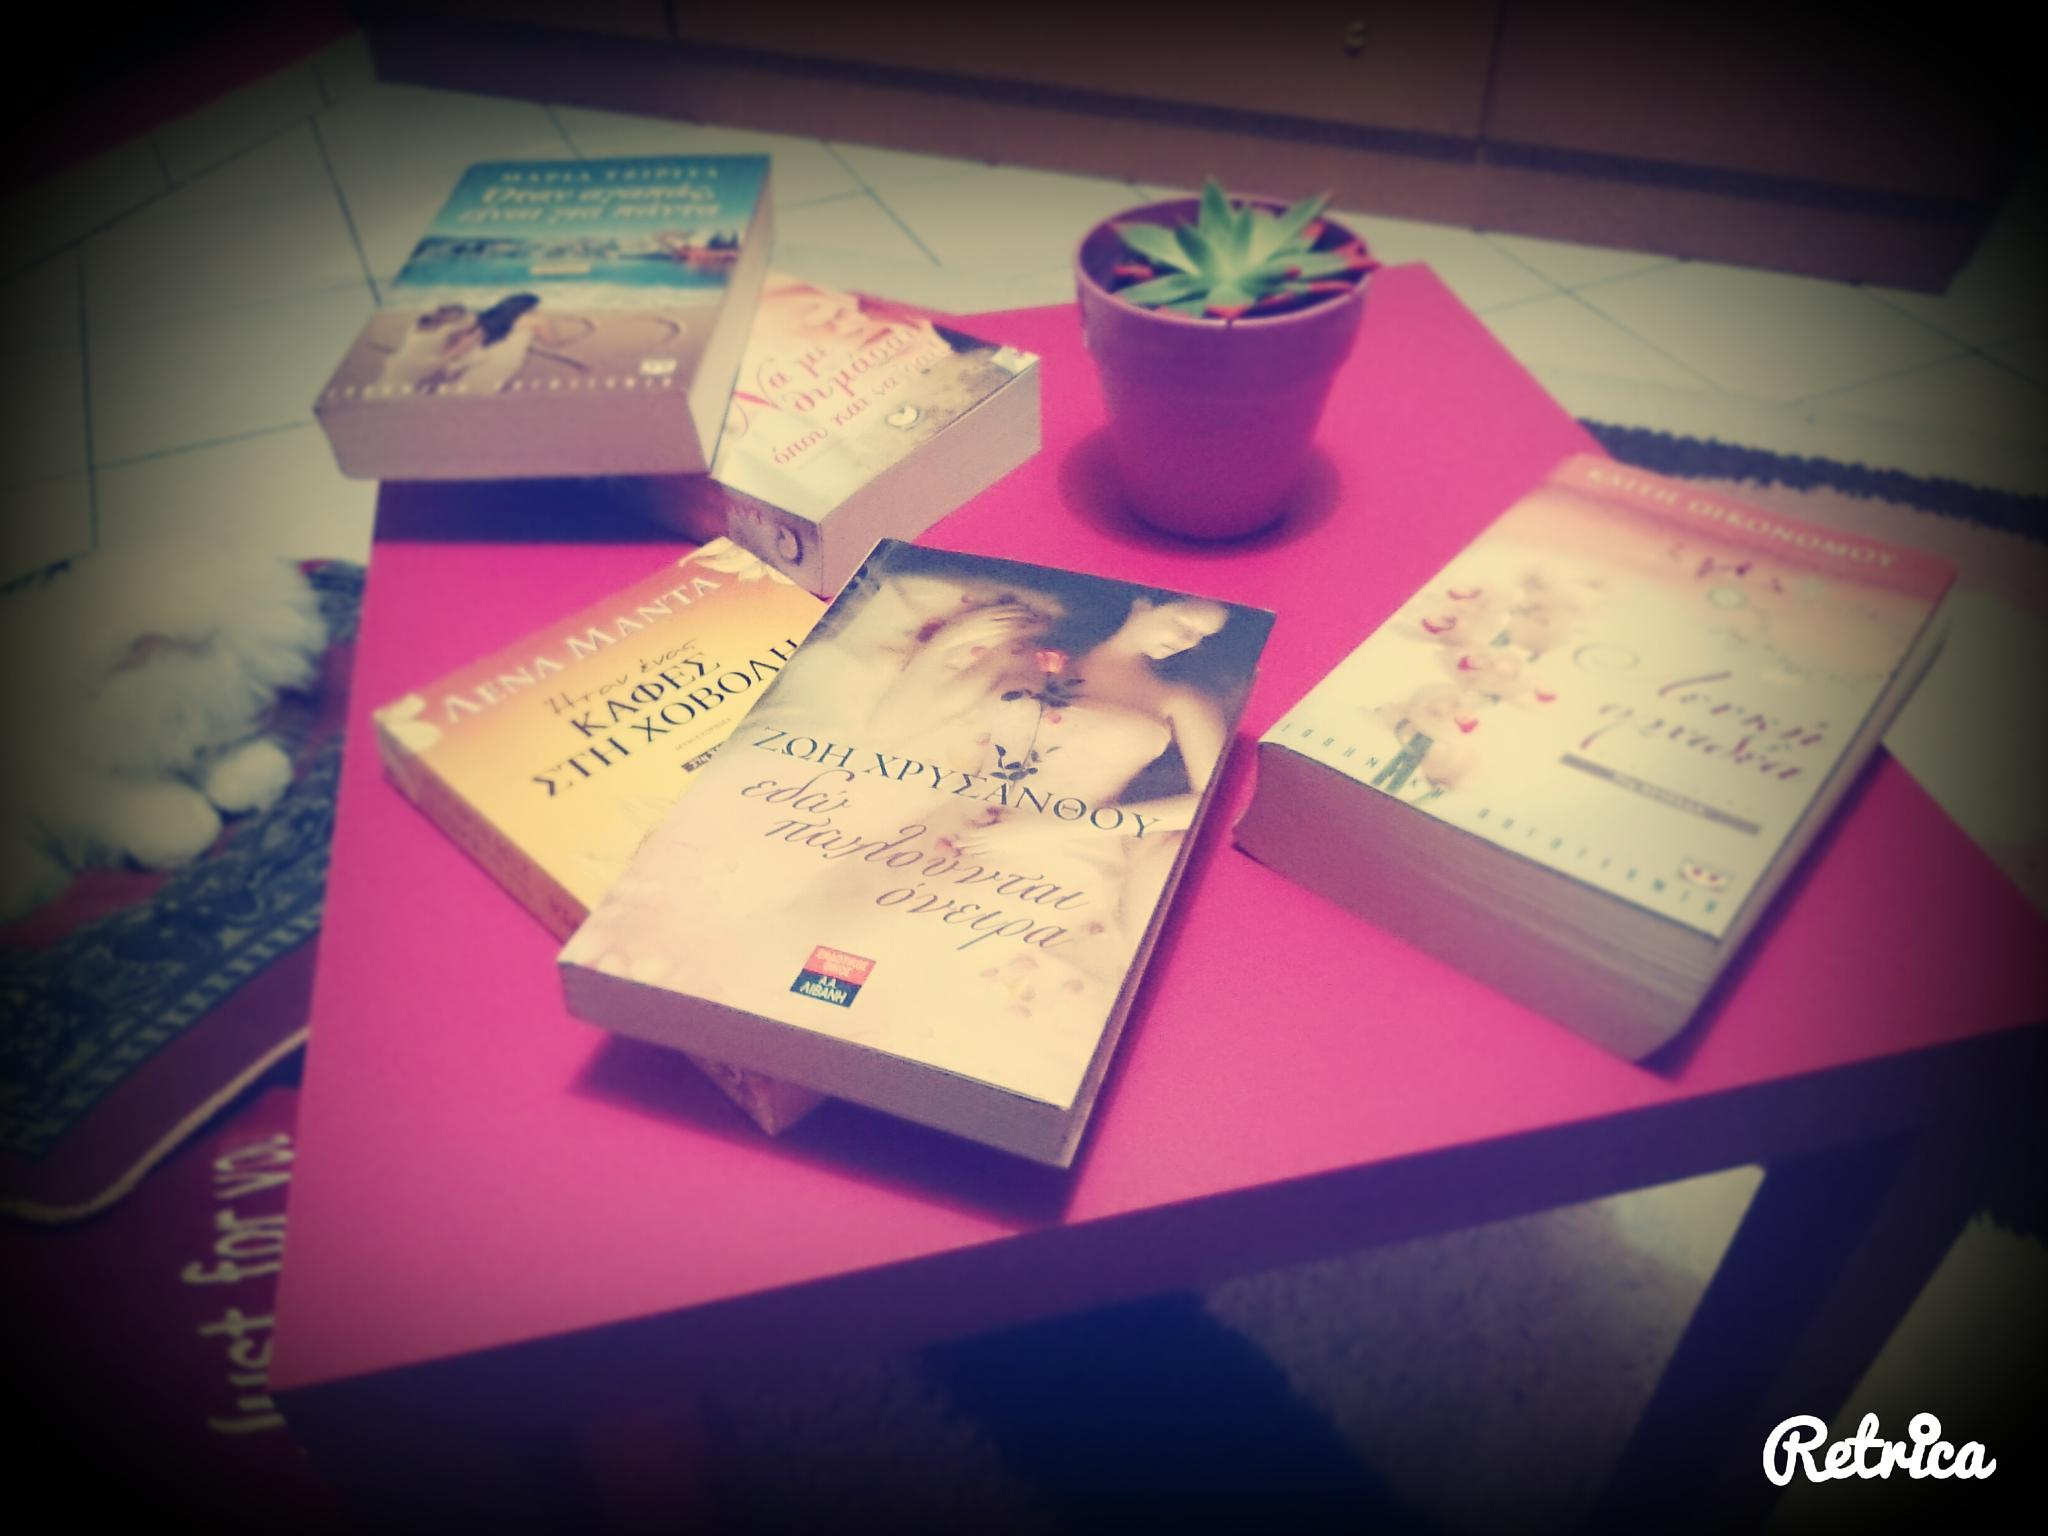 My Book by lena.tsakalaki